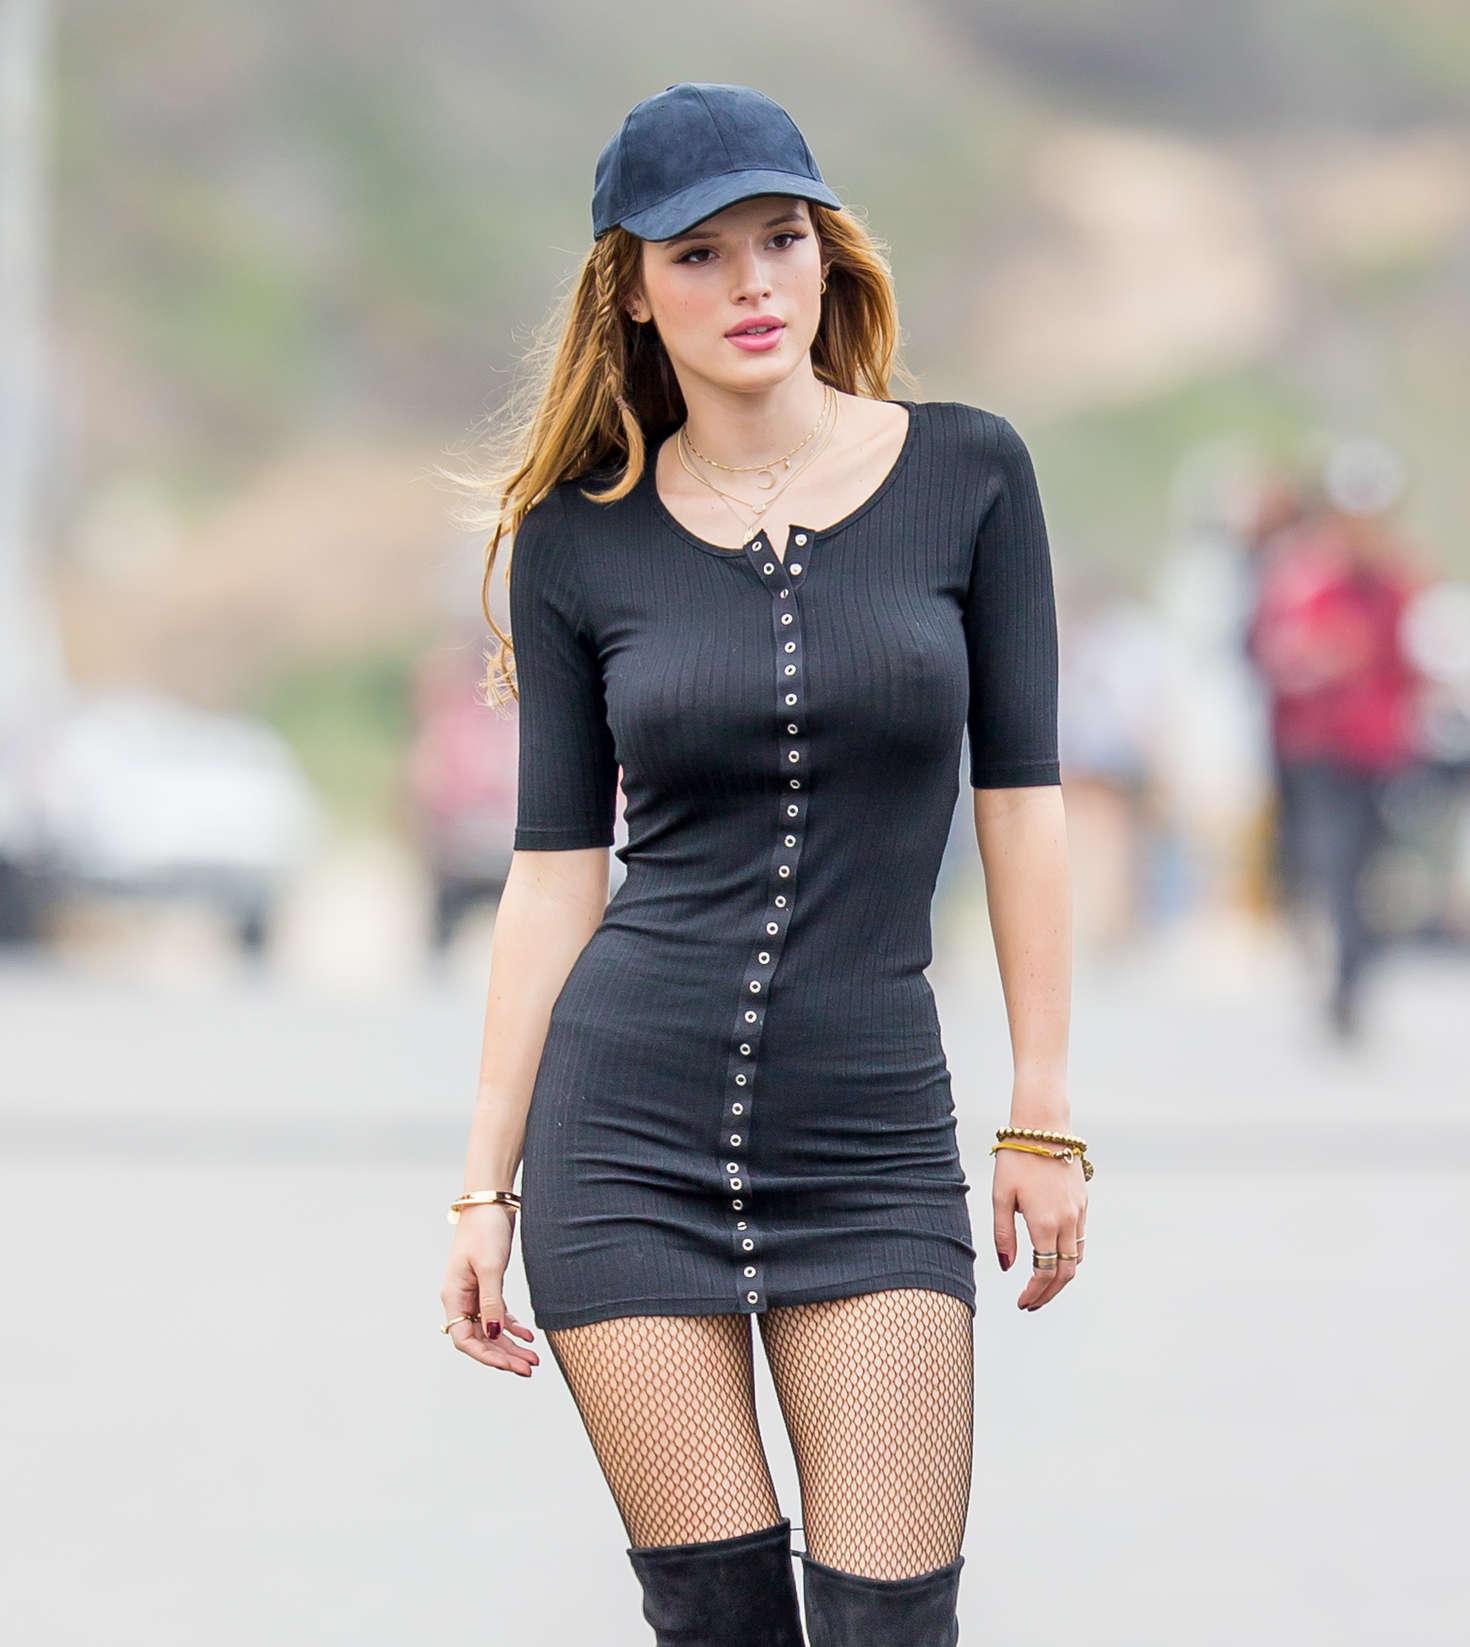 Huge Puffy Nipples Pics Good bella thorne huge puffy n*pples in see thru dress